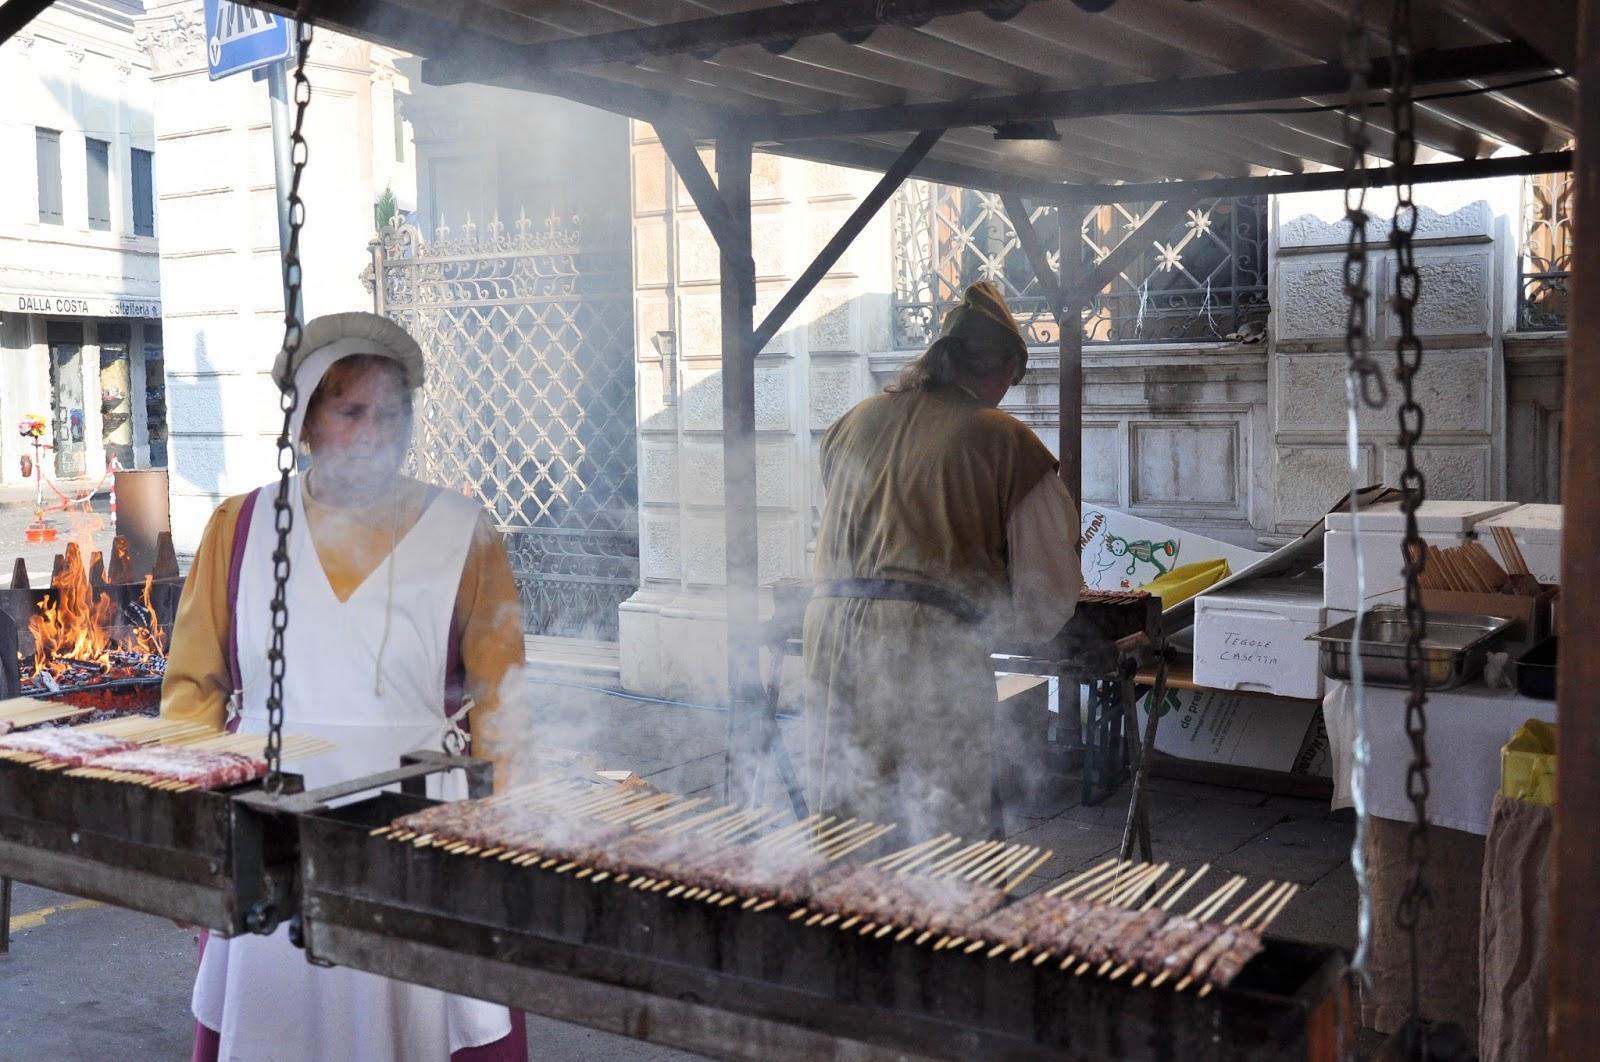 Roasting the Arrosticini Thienesi on hot coals, Thiene, Veneto, Italy